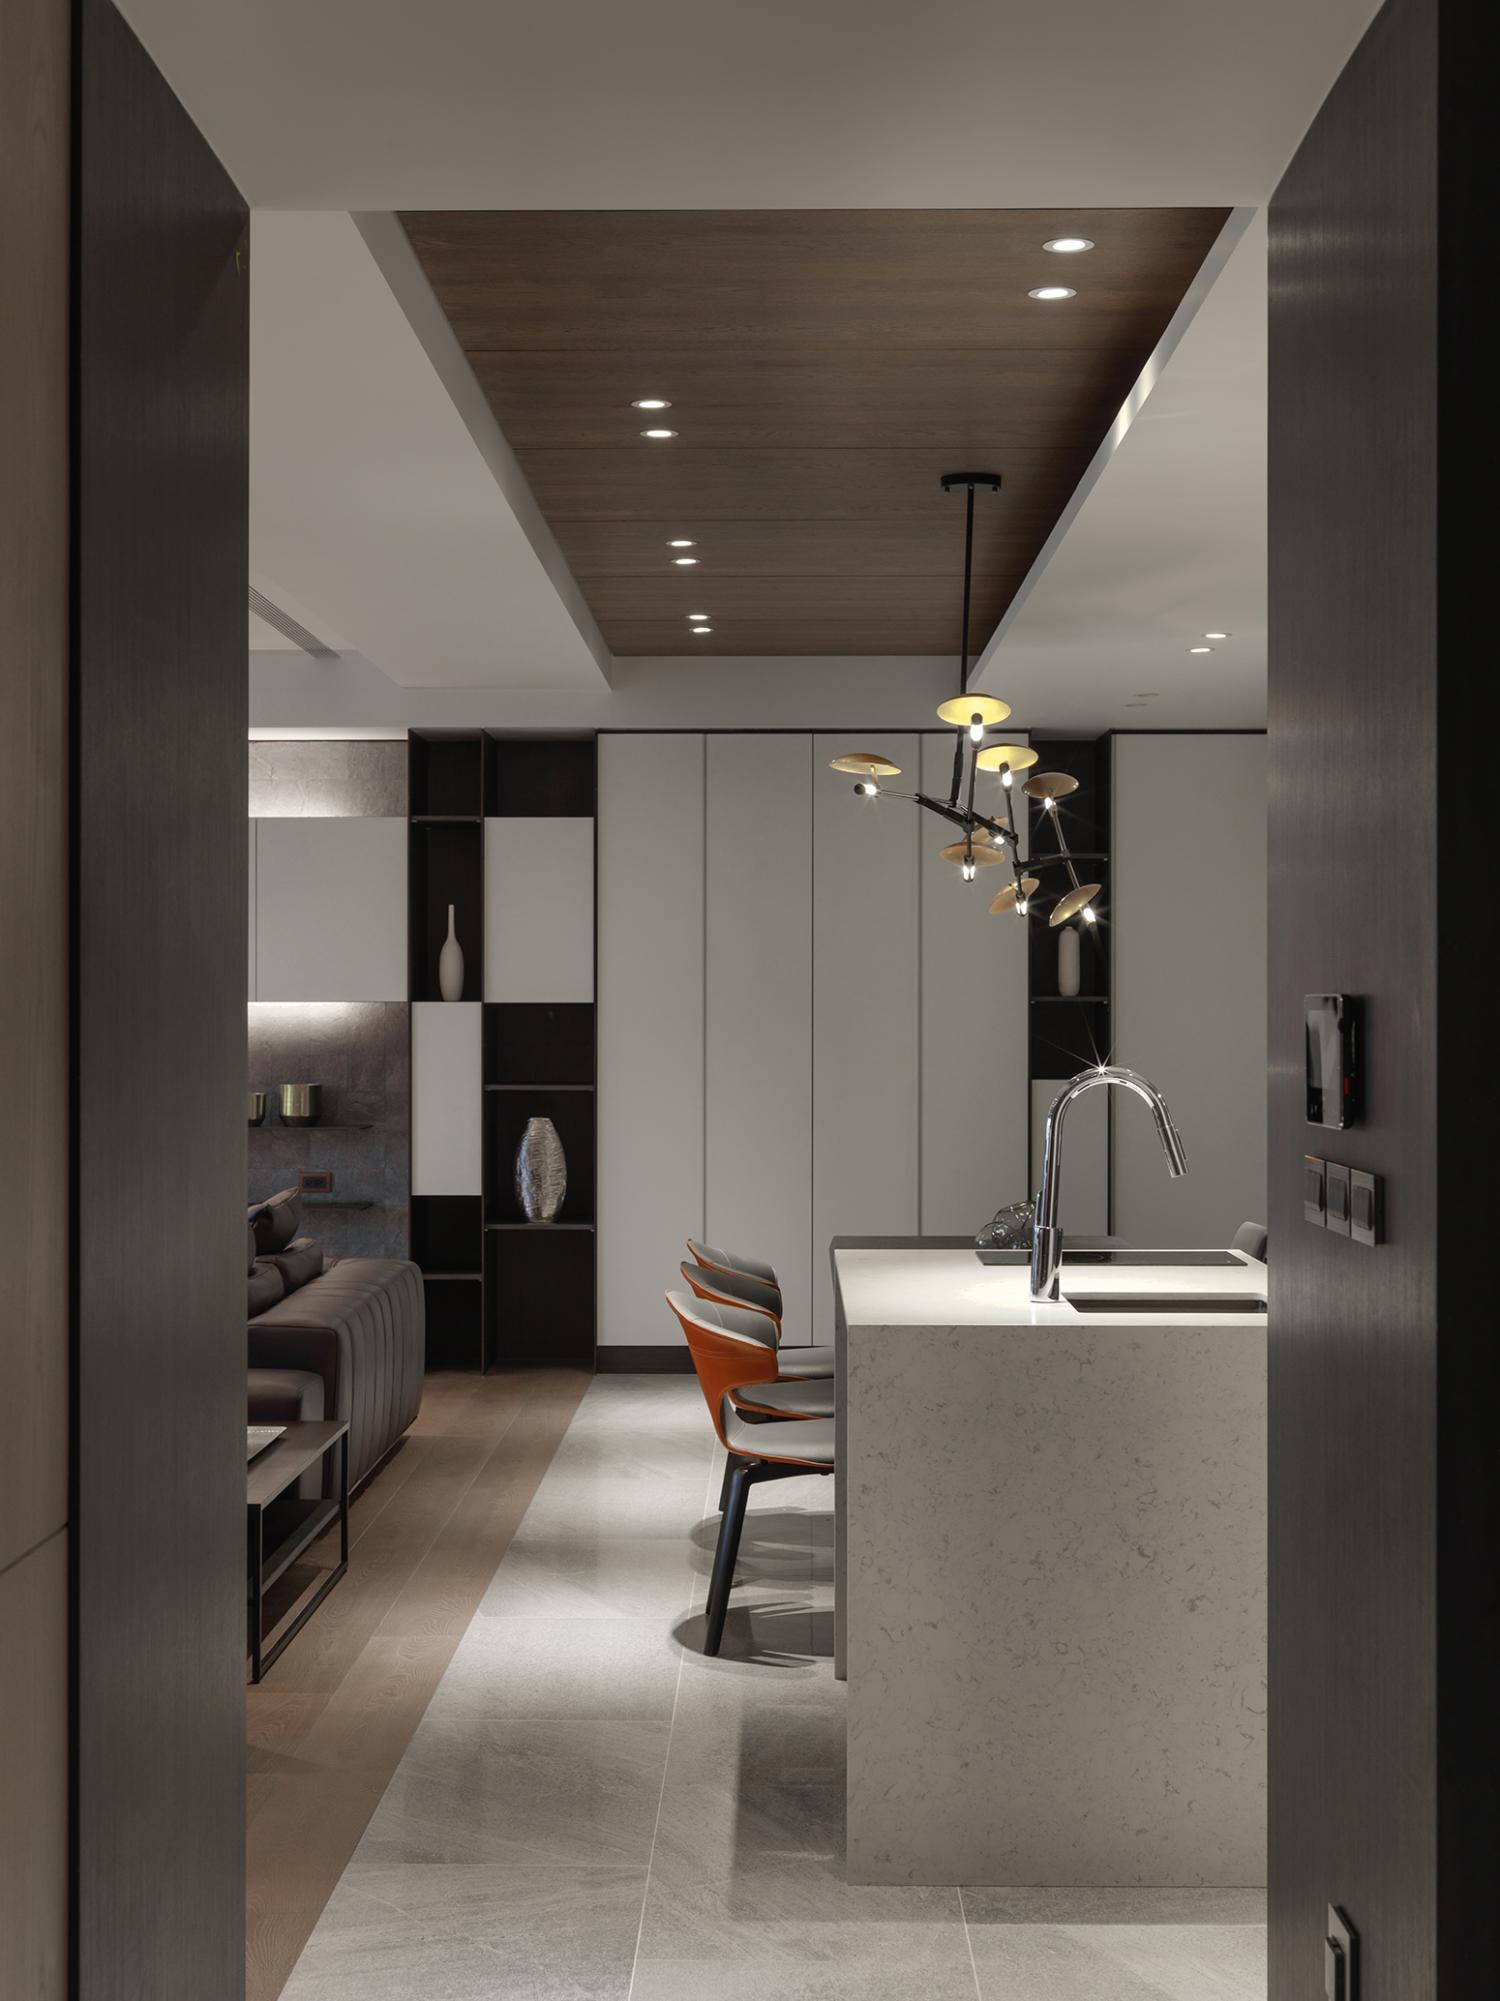 Interior Image 314